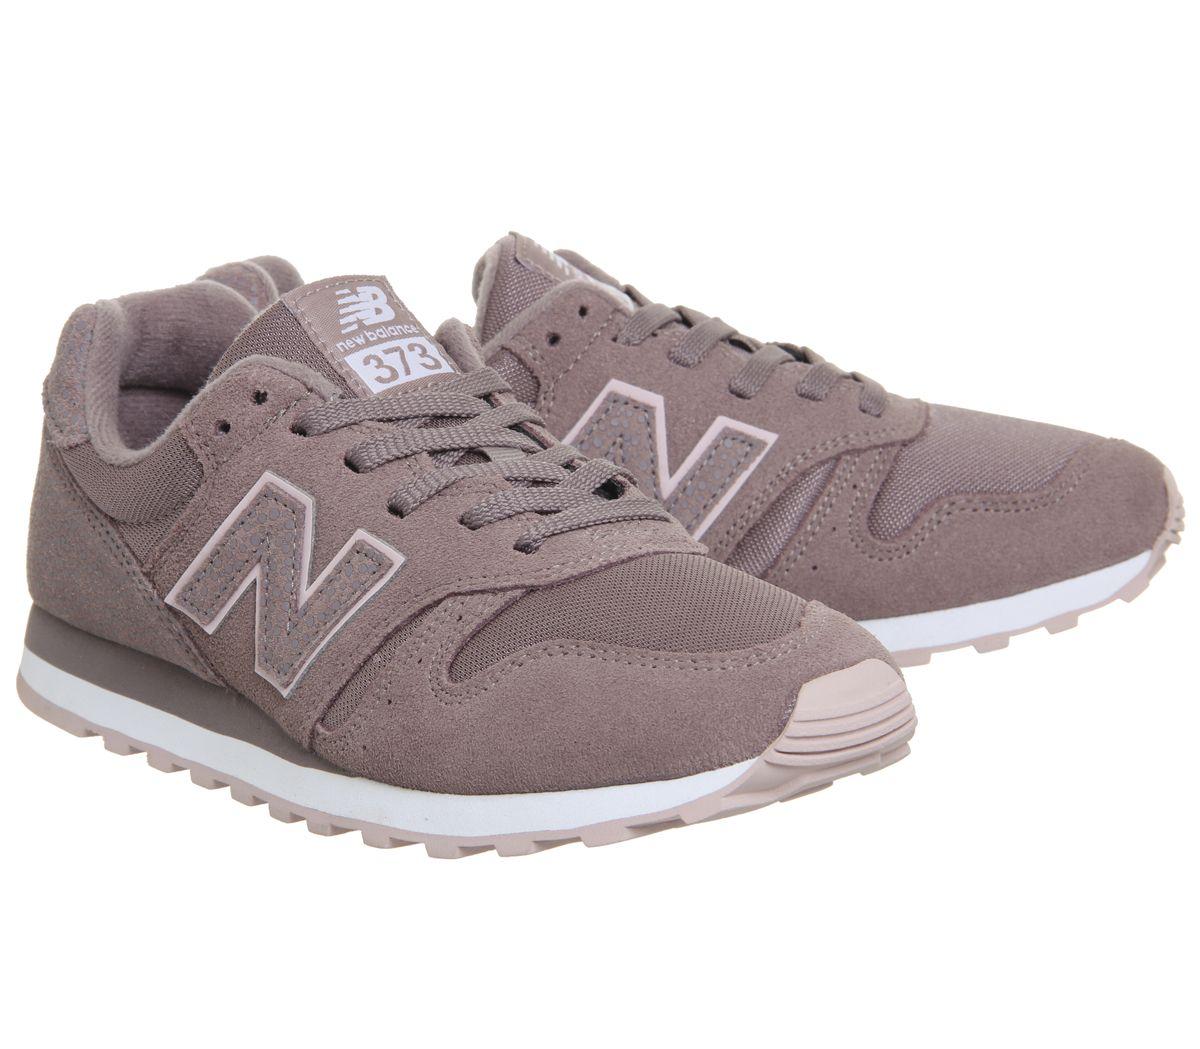 la meilleure attitude 6ebc5 f4609 Details about Womens New Balance W373 Trainers Latte Exclusive Trainers  Shoes